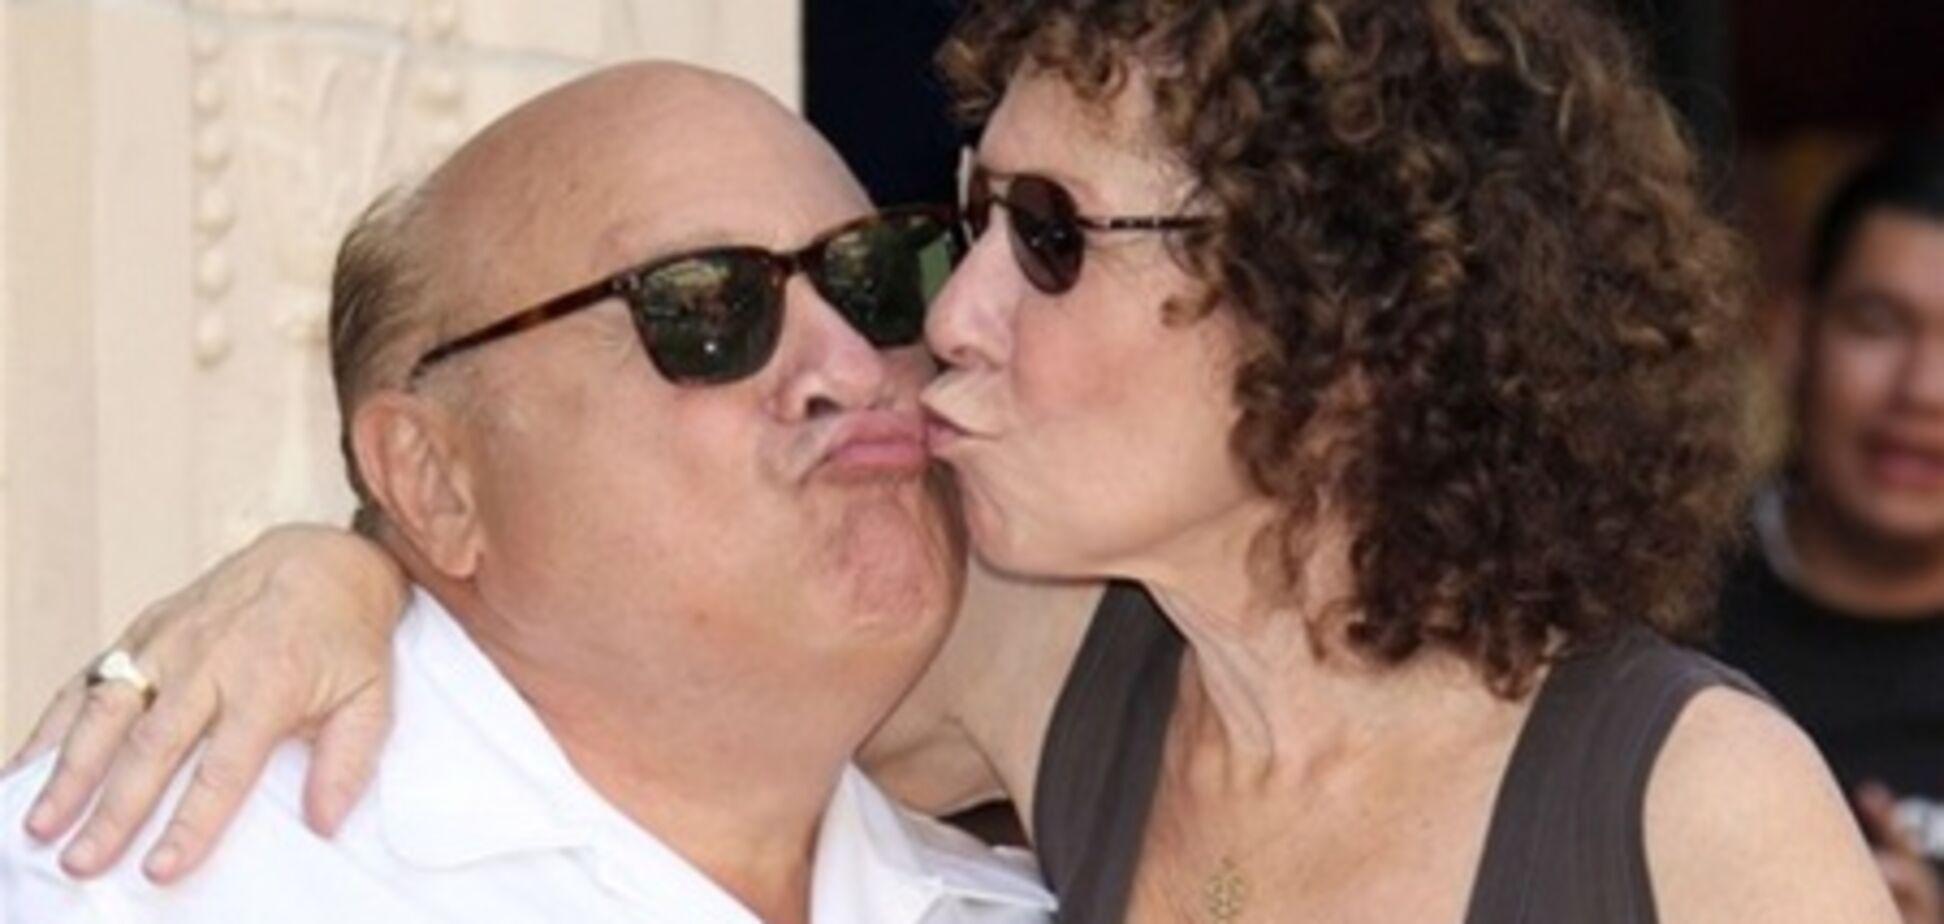 ДеВито подал на развод после 30 лет брака